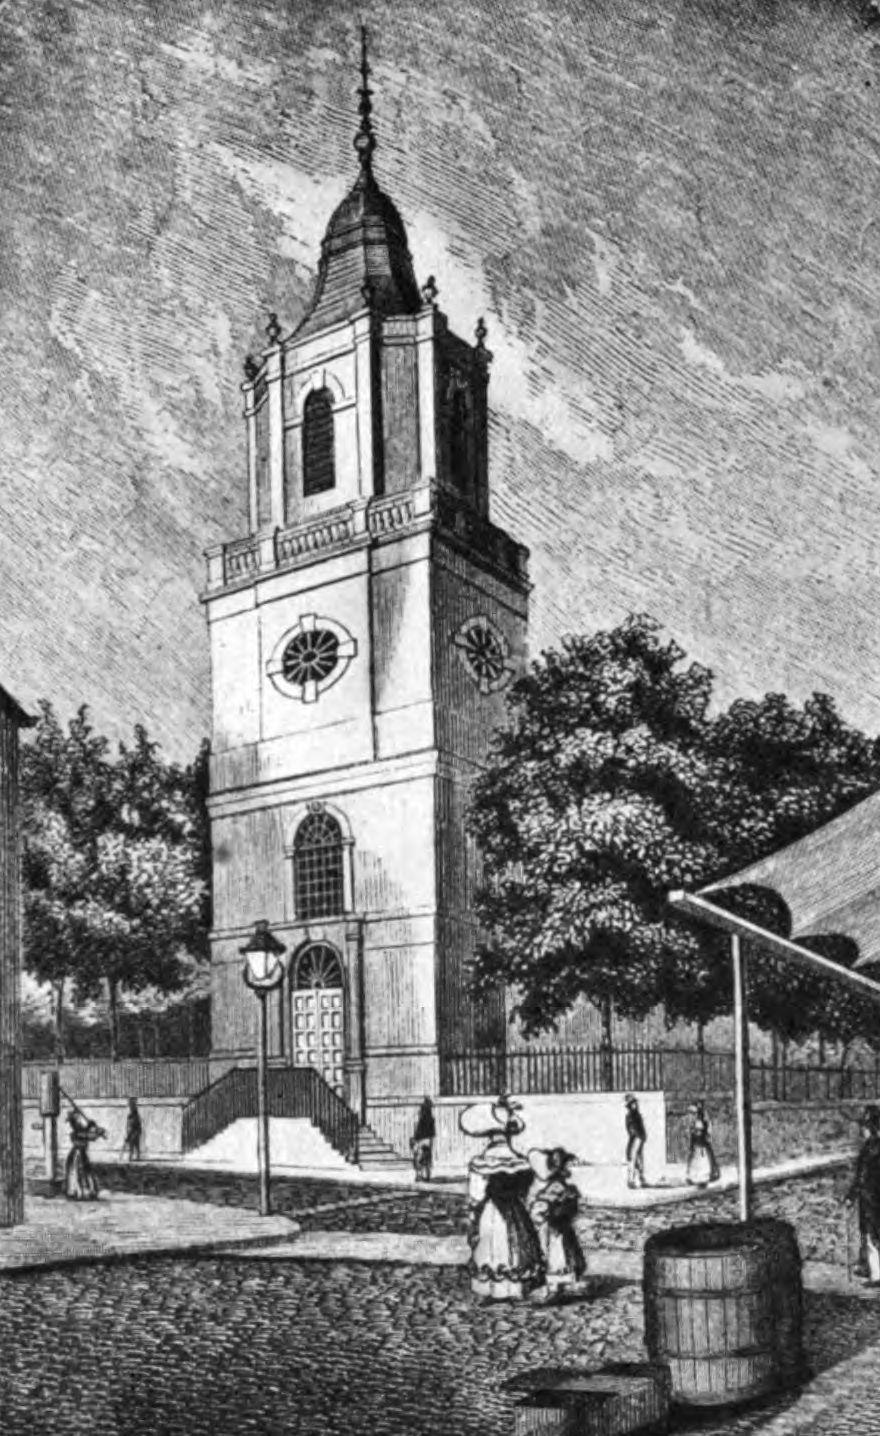 Old_Saint_Peter's_Roman_Catholic_Church,_Manhattan,_New_York.jpg (880×1436)